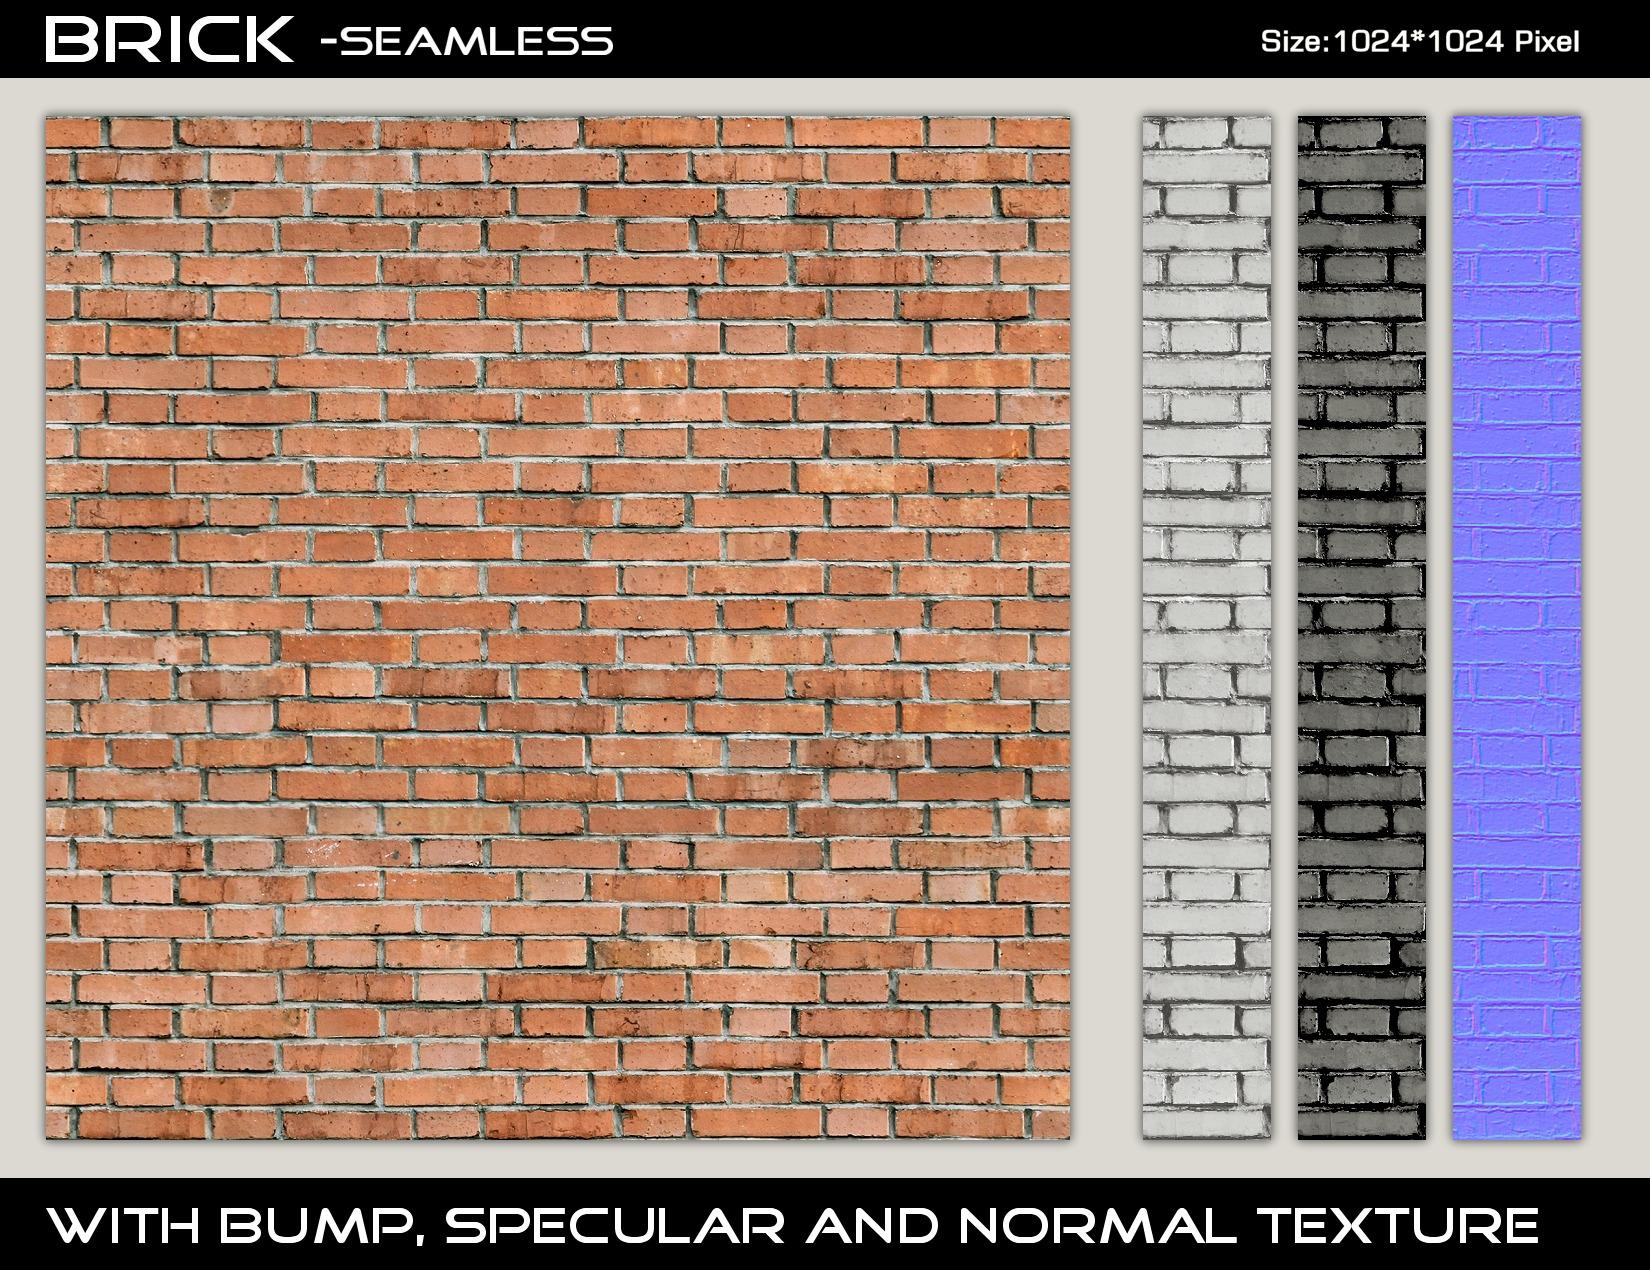 Brick 4 - Seamless